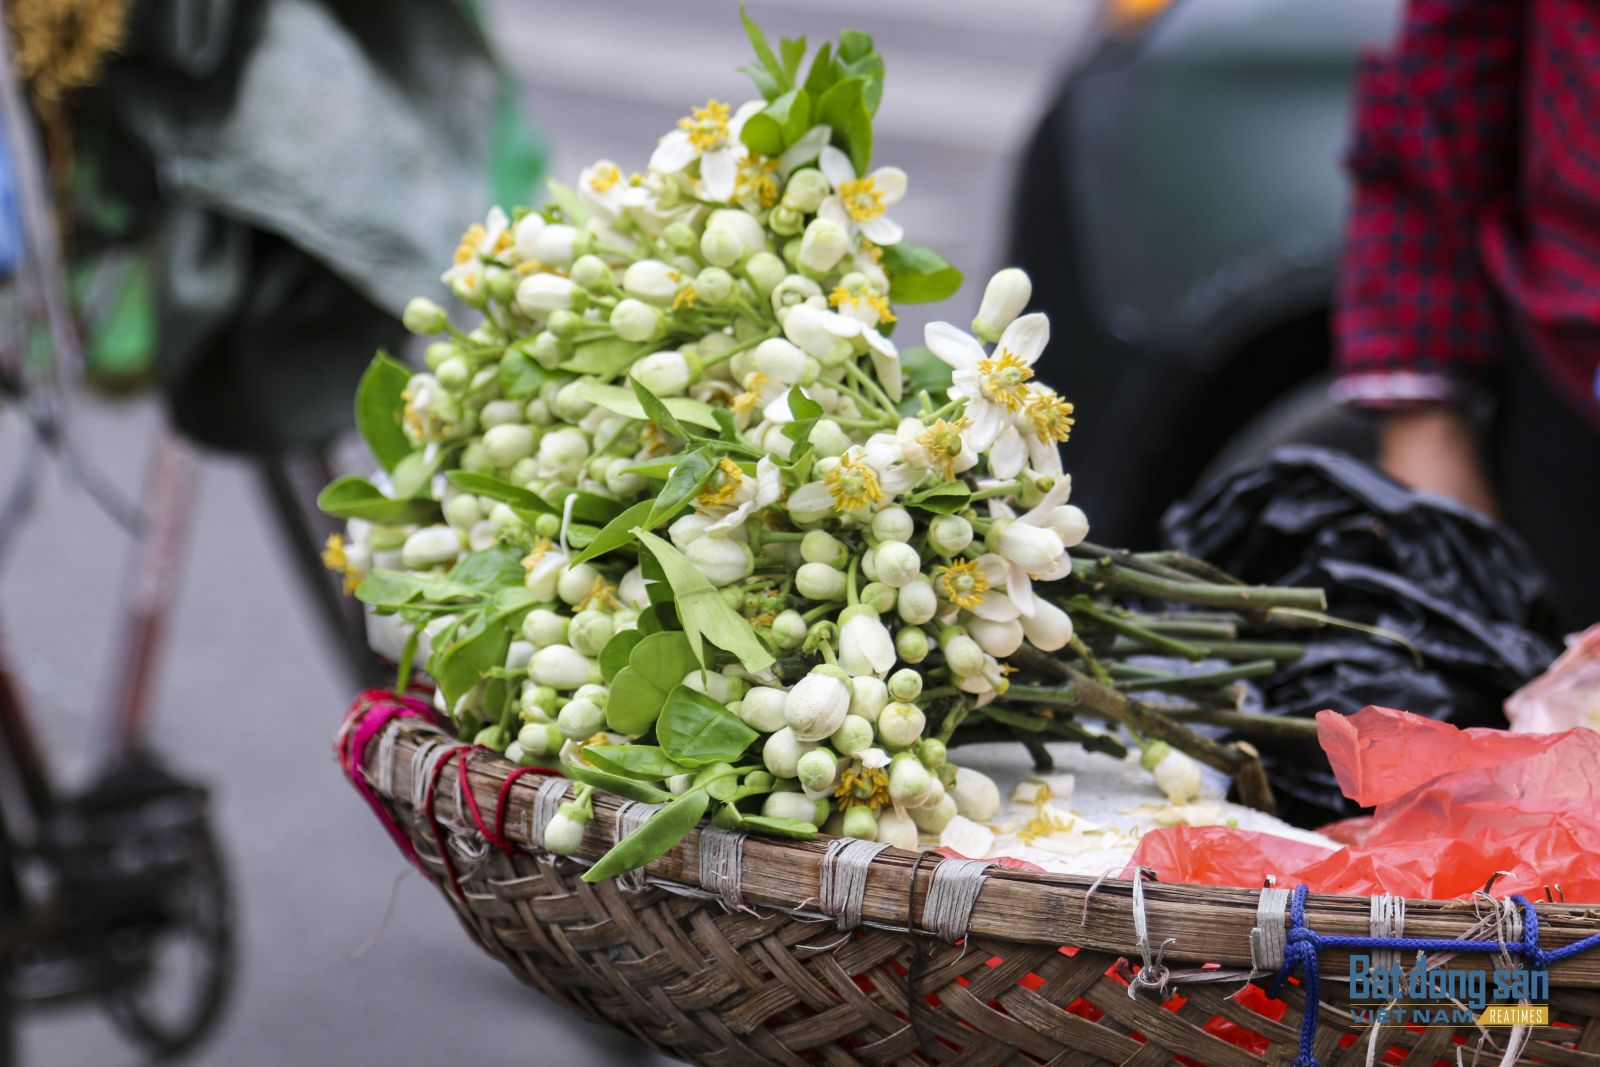 Mua hoa bưởi